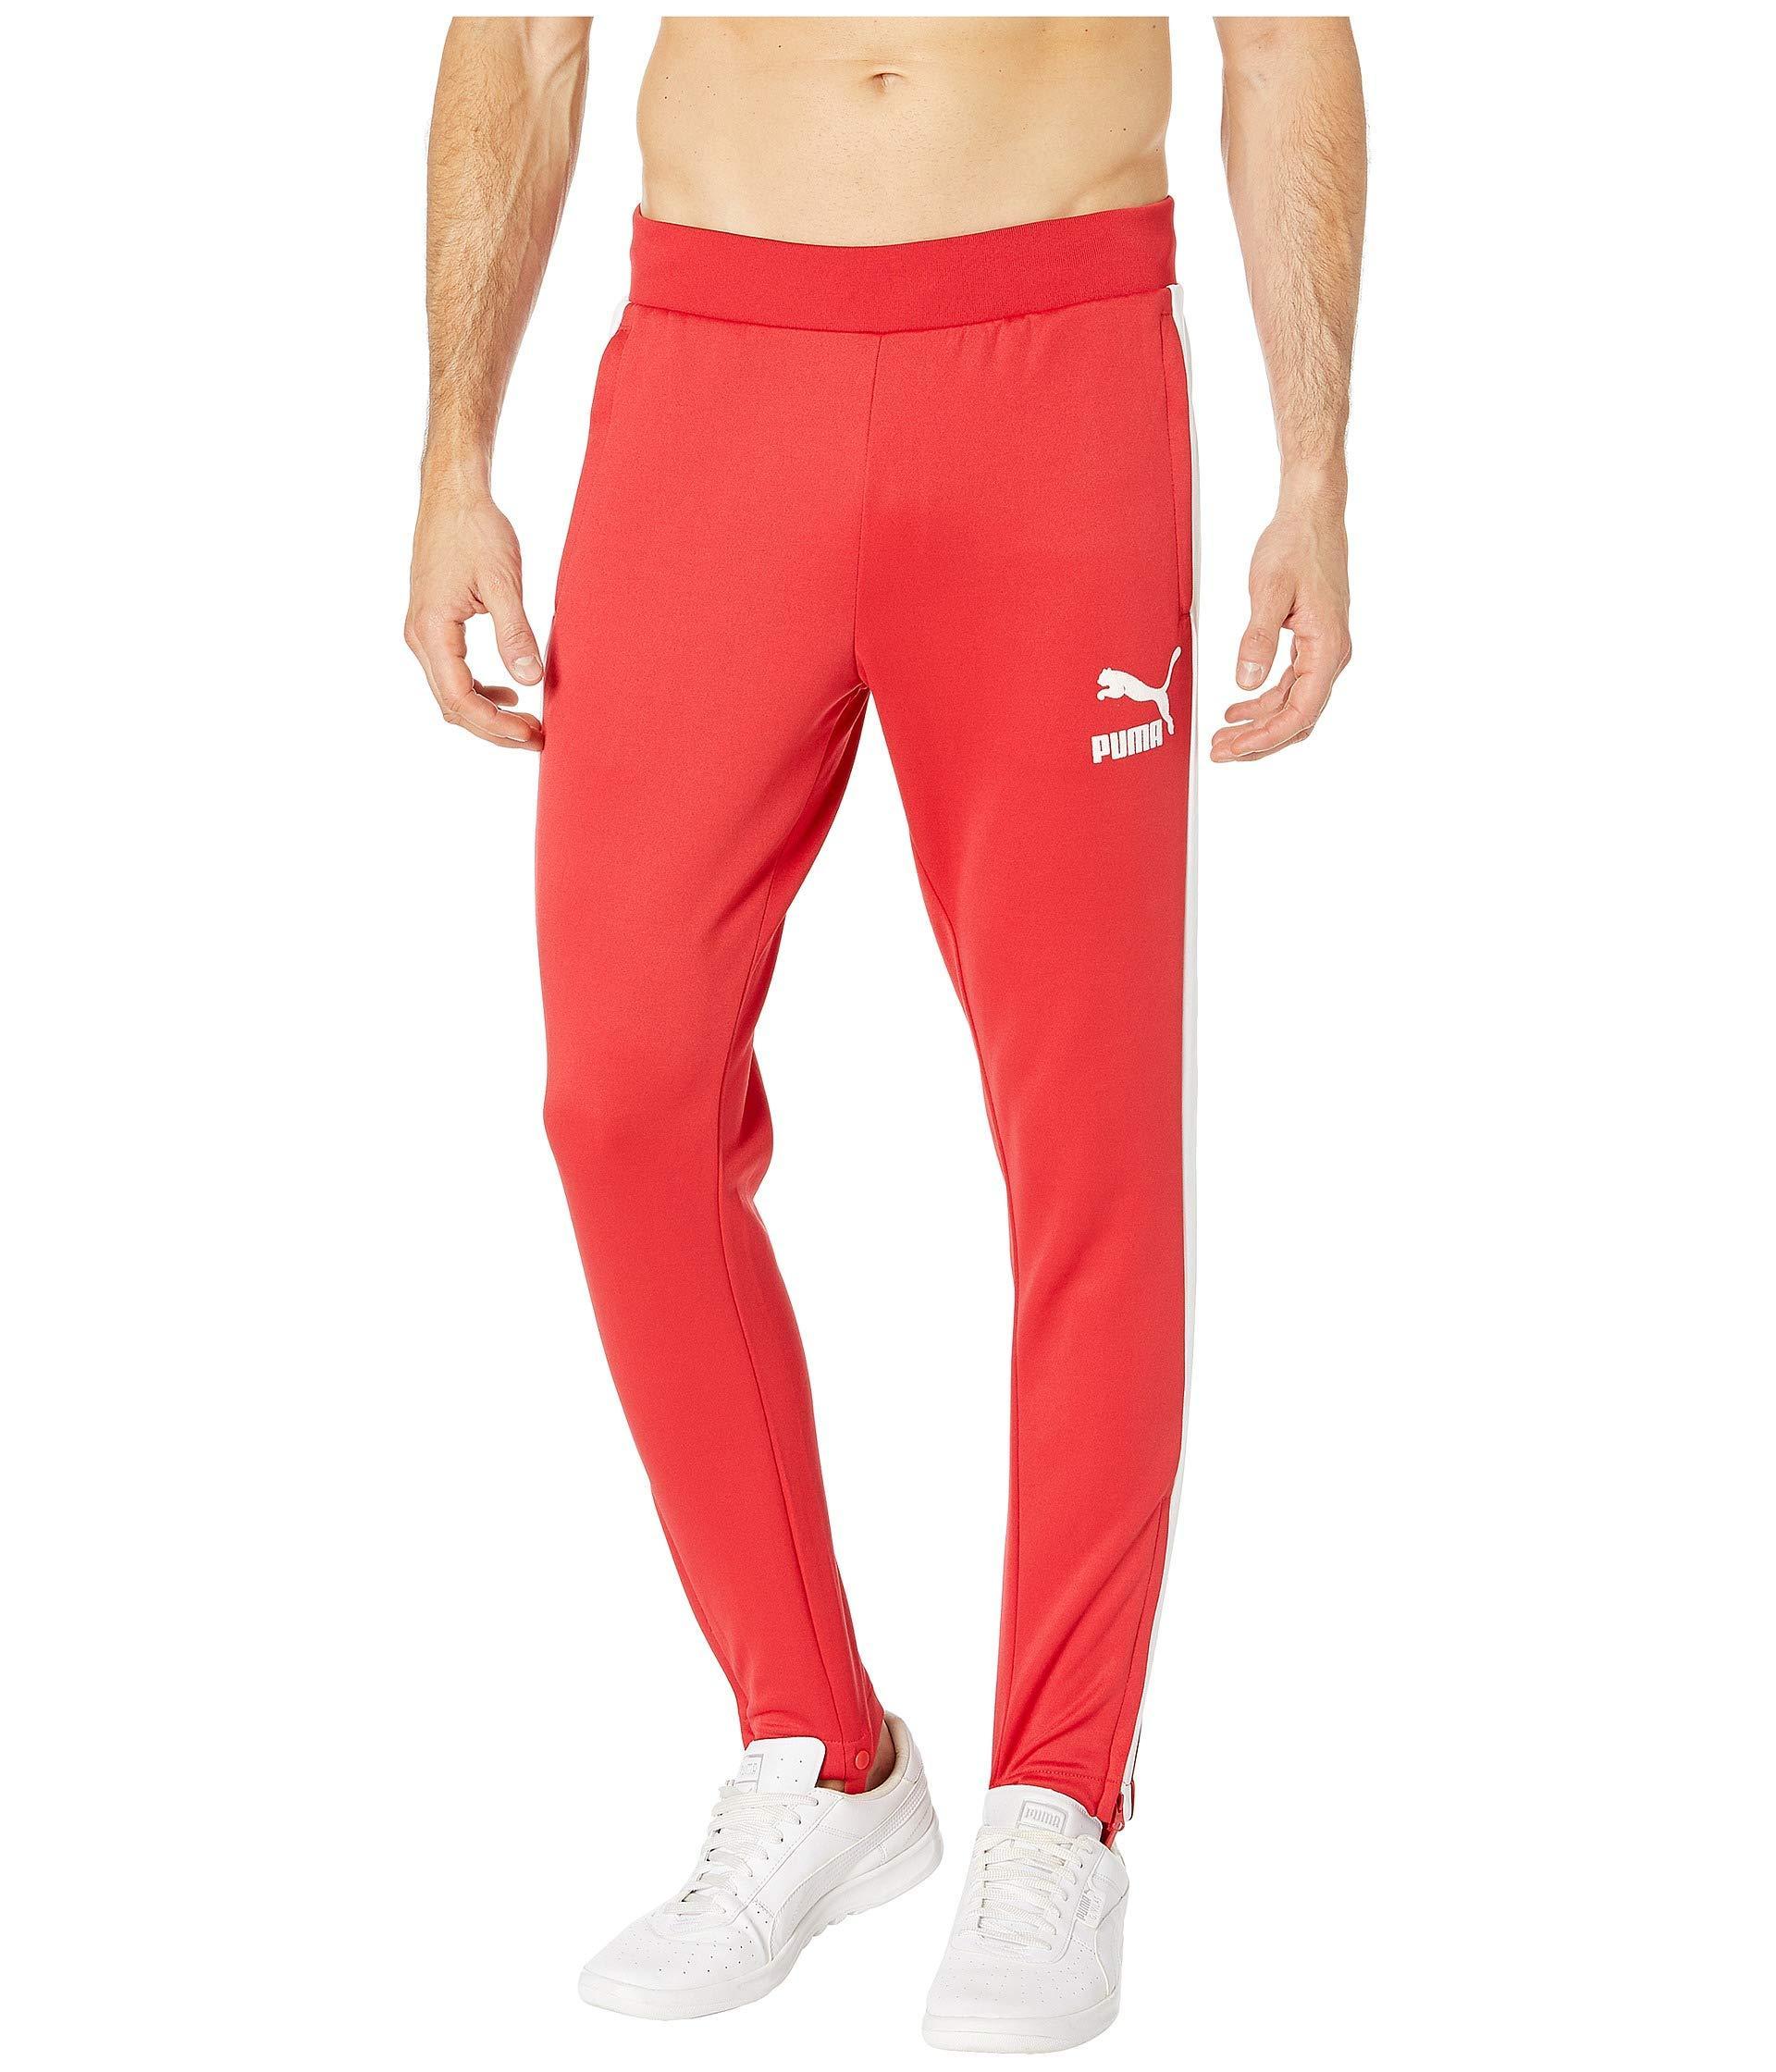 8f62eead0cc4 PUMA - Red T7 Vintage Track Pants for Men - Lyst. View fullscreen